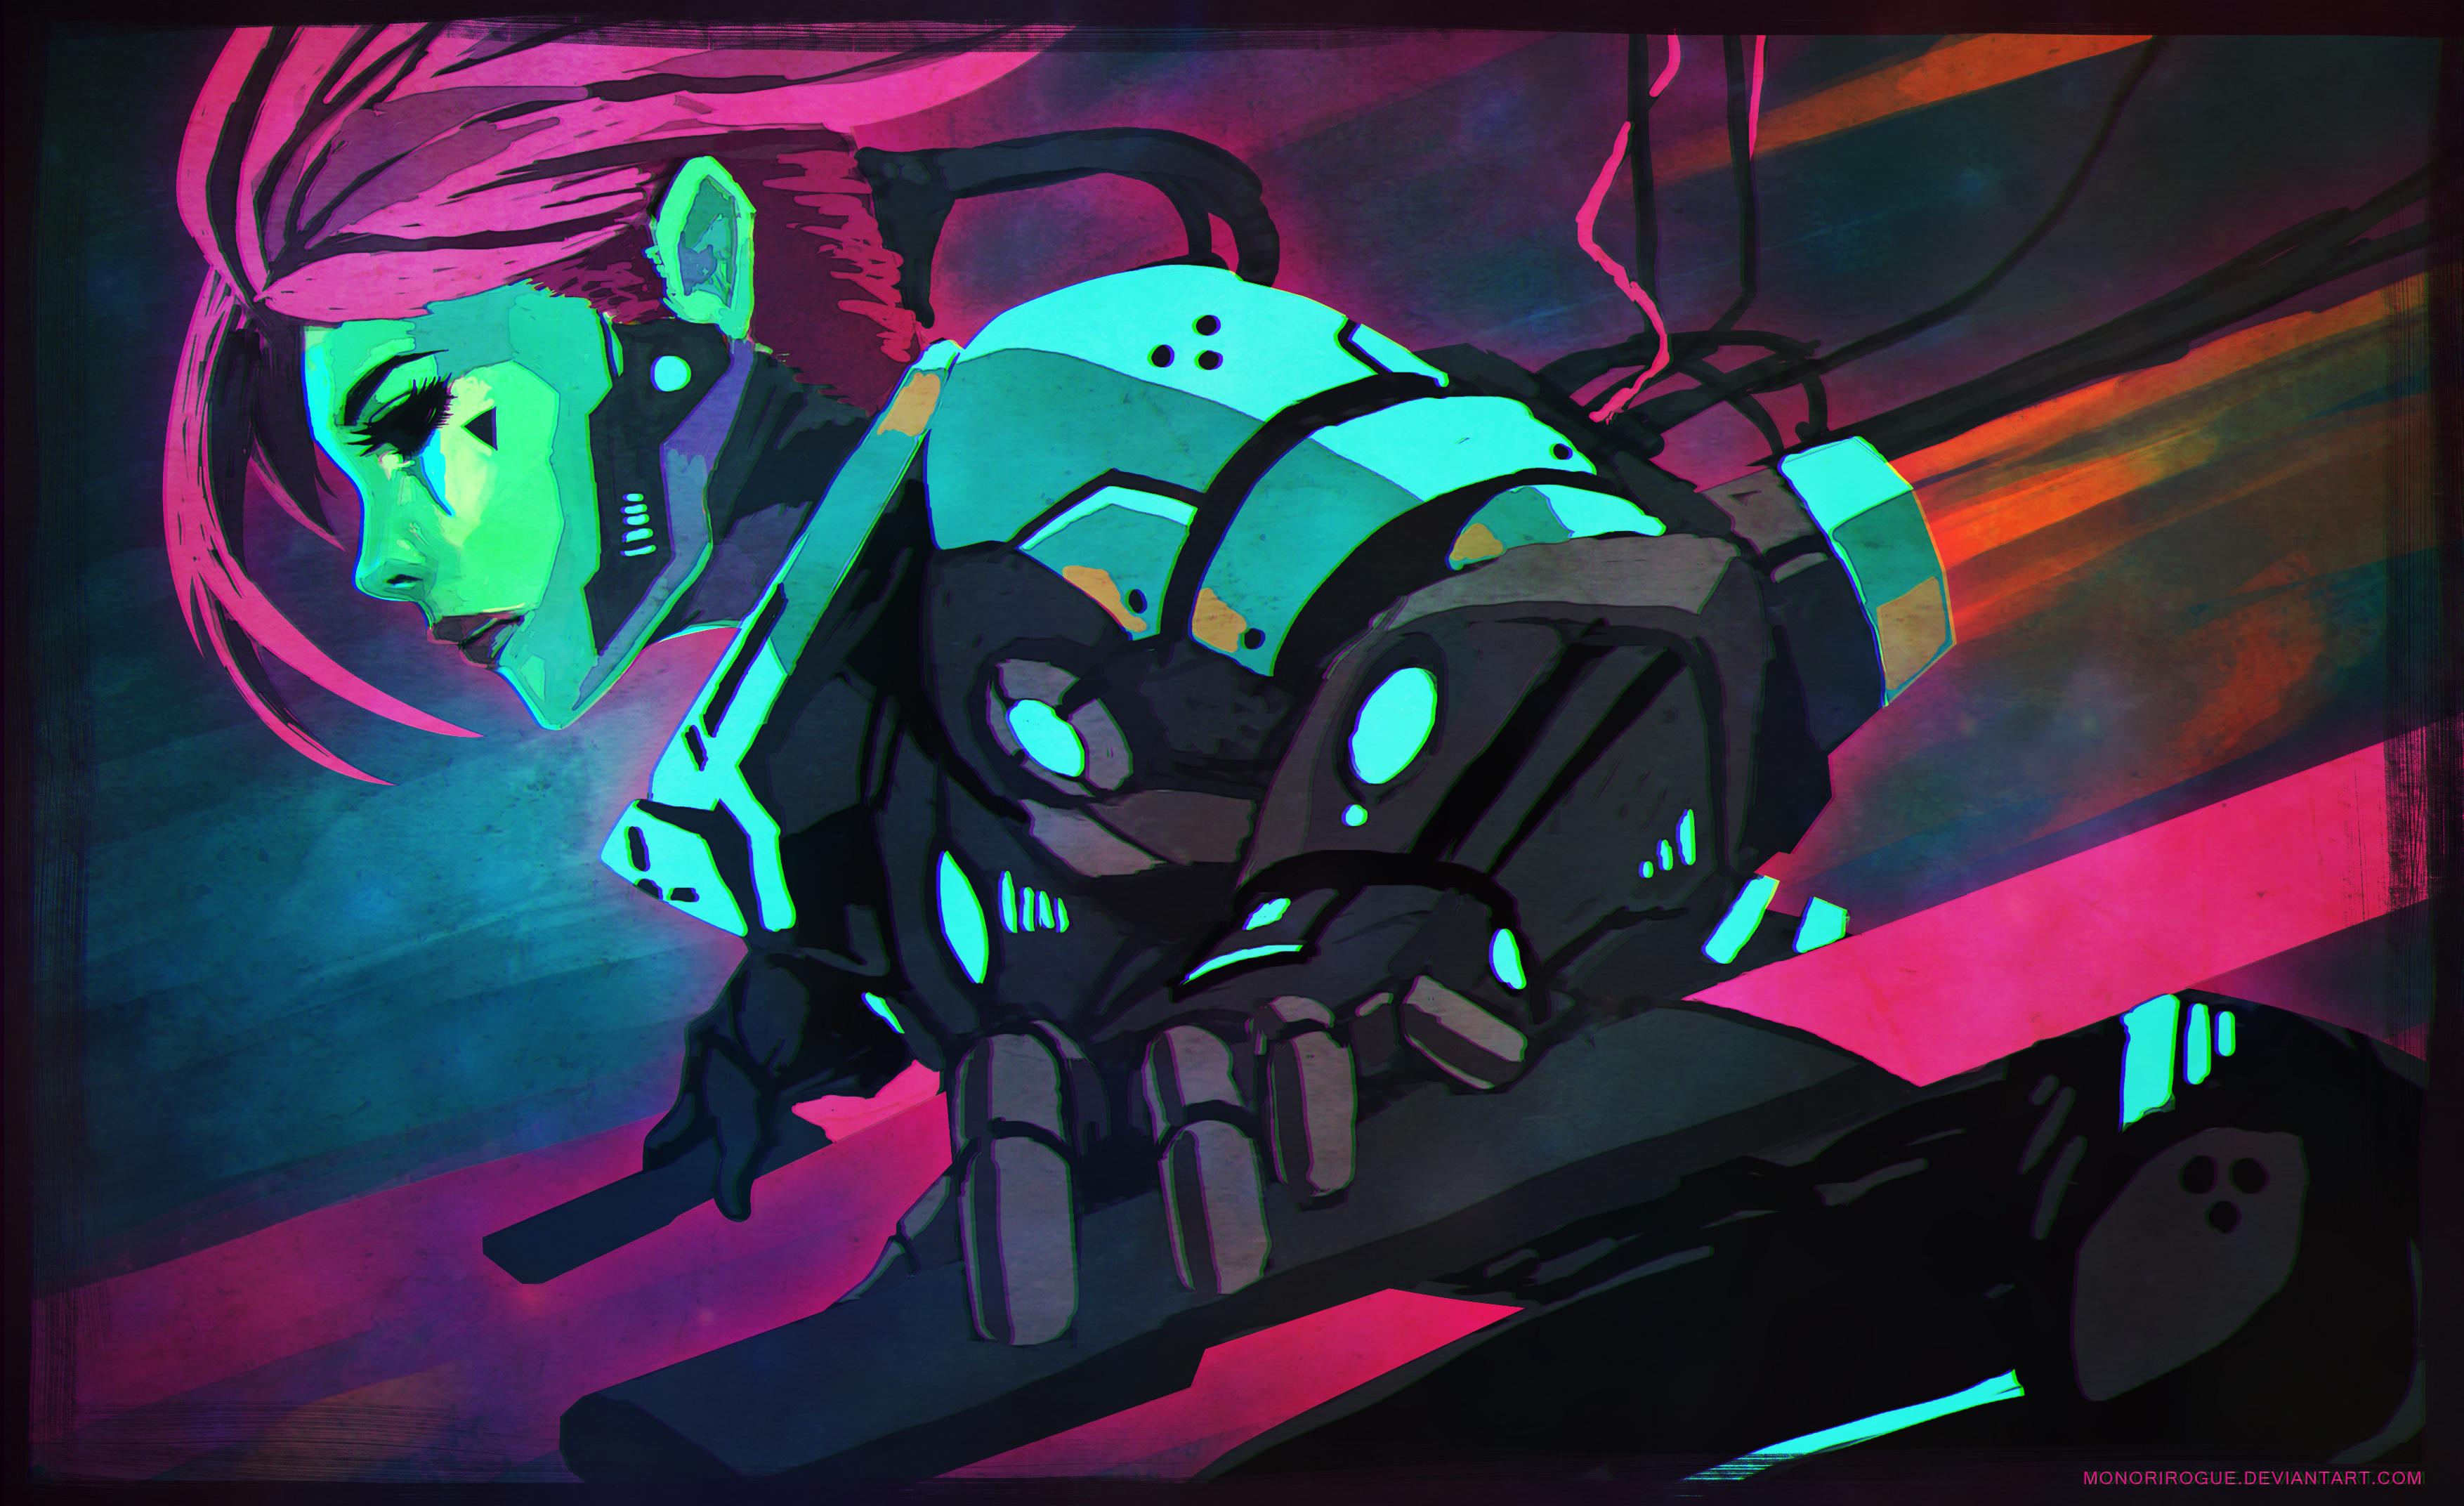 General 3508x2144 cyberpunk cyborg digital art futuristic